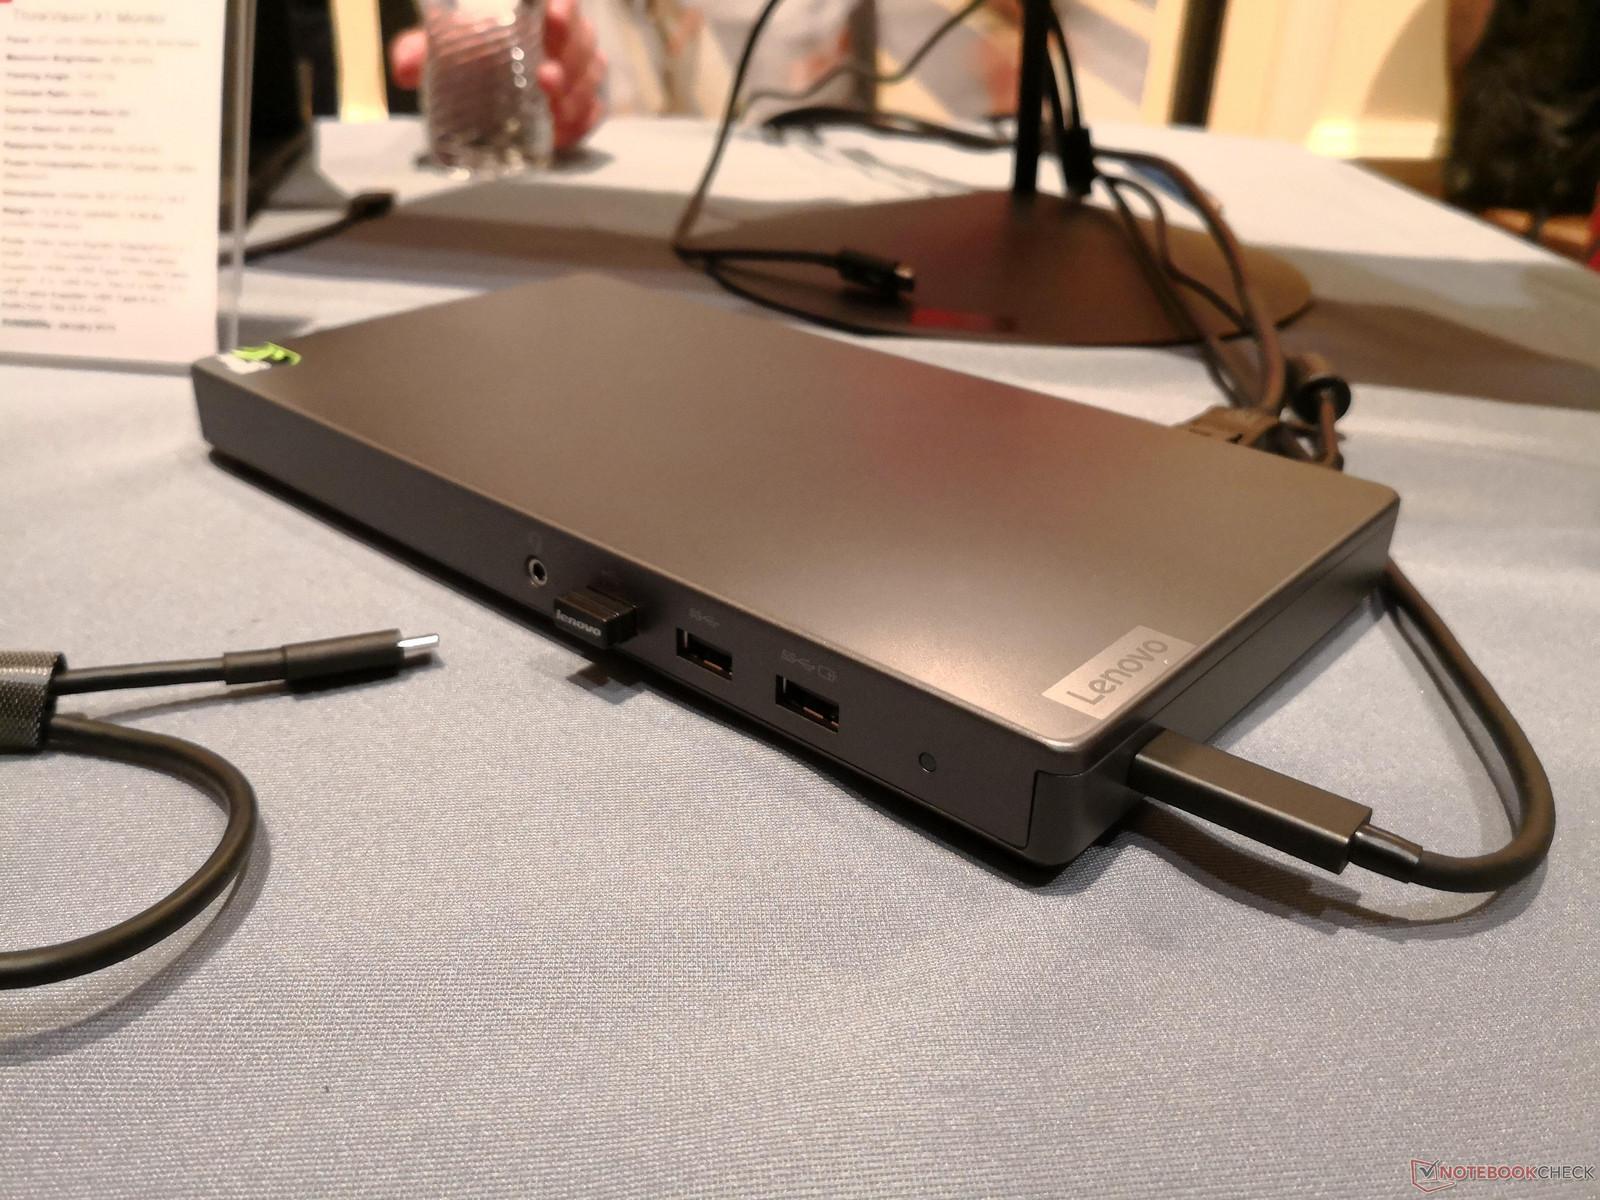 Portable Lenovo Thunderbolt 3 dock integrates a GTX 1050 GPU